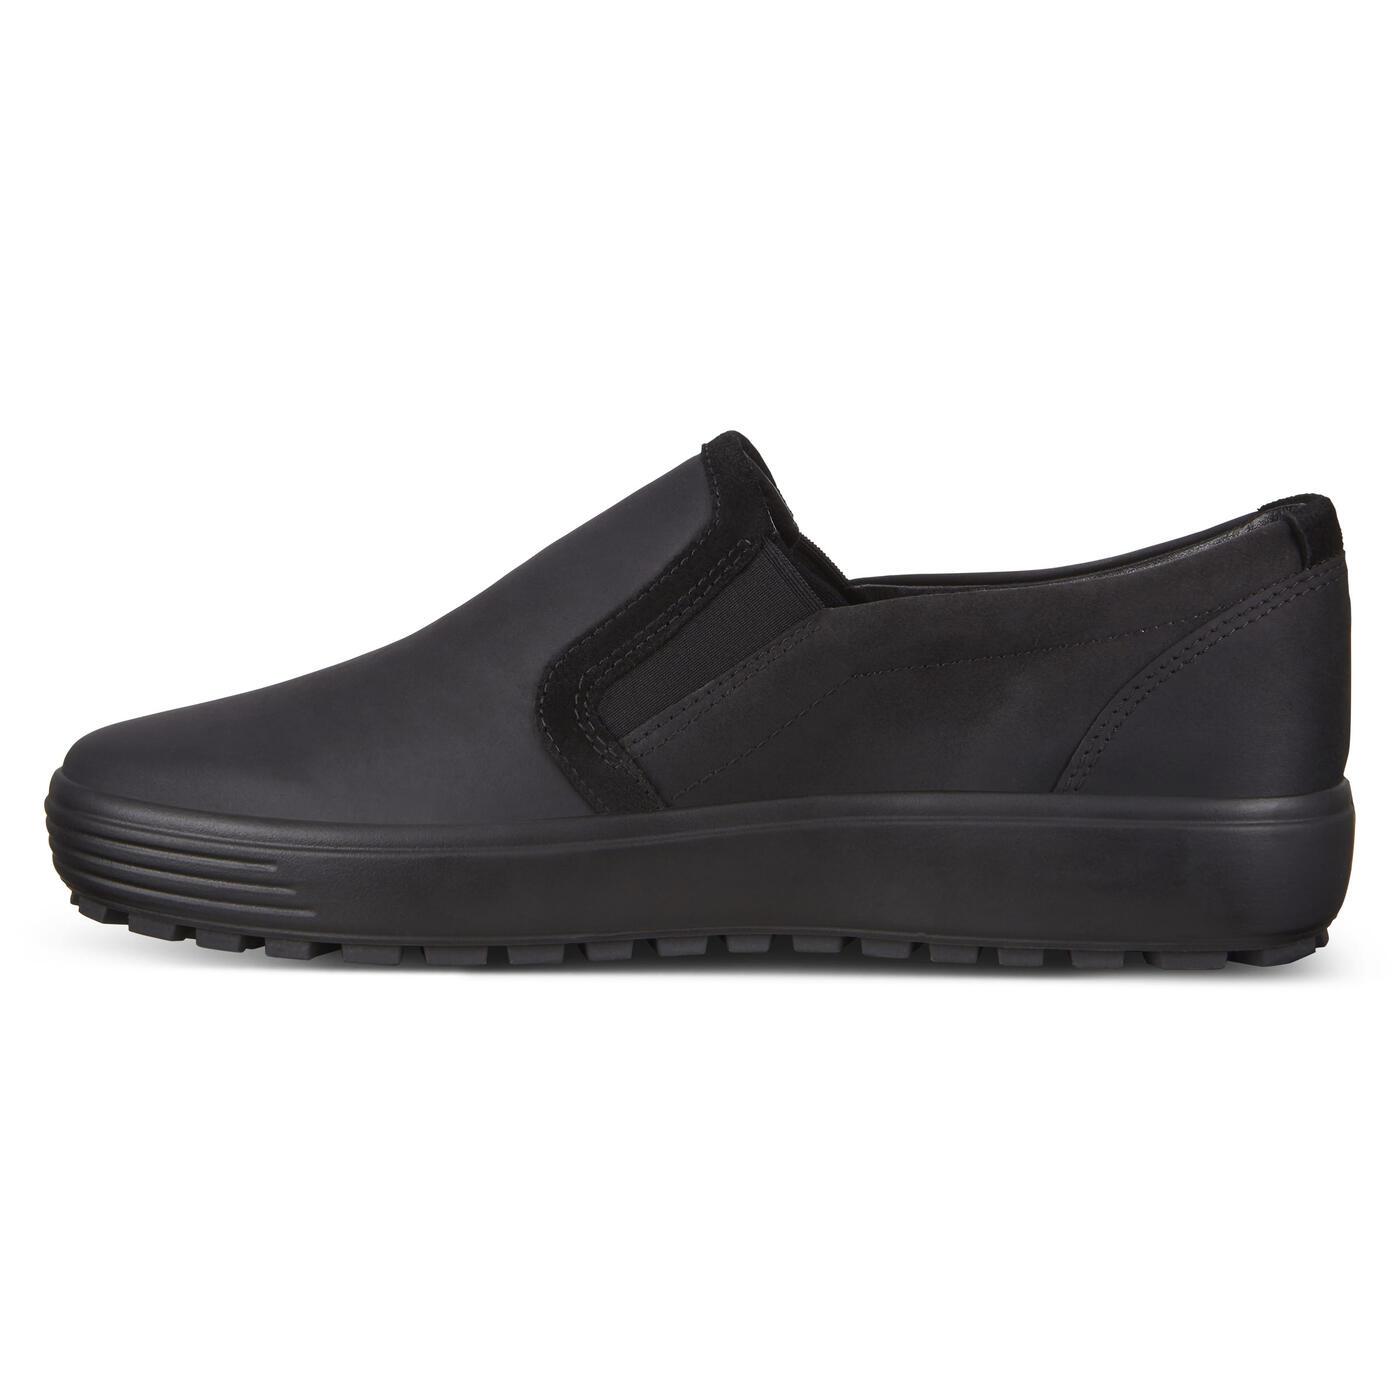 ECCO SOFT 7 TRED GTX Men's Sneaker